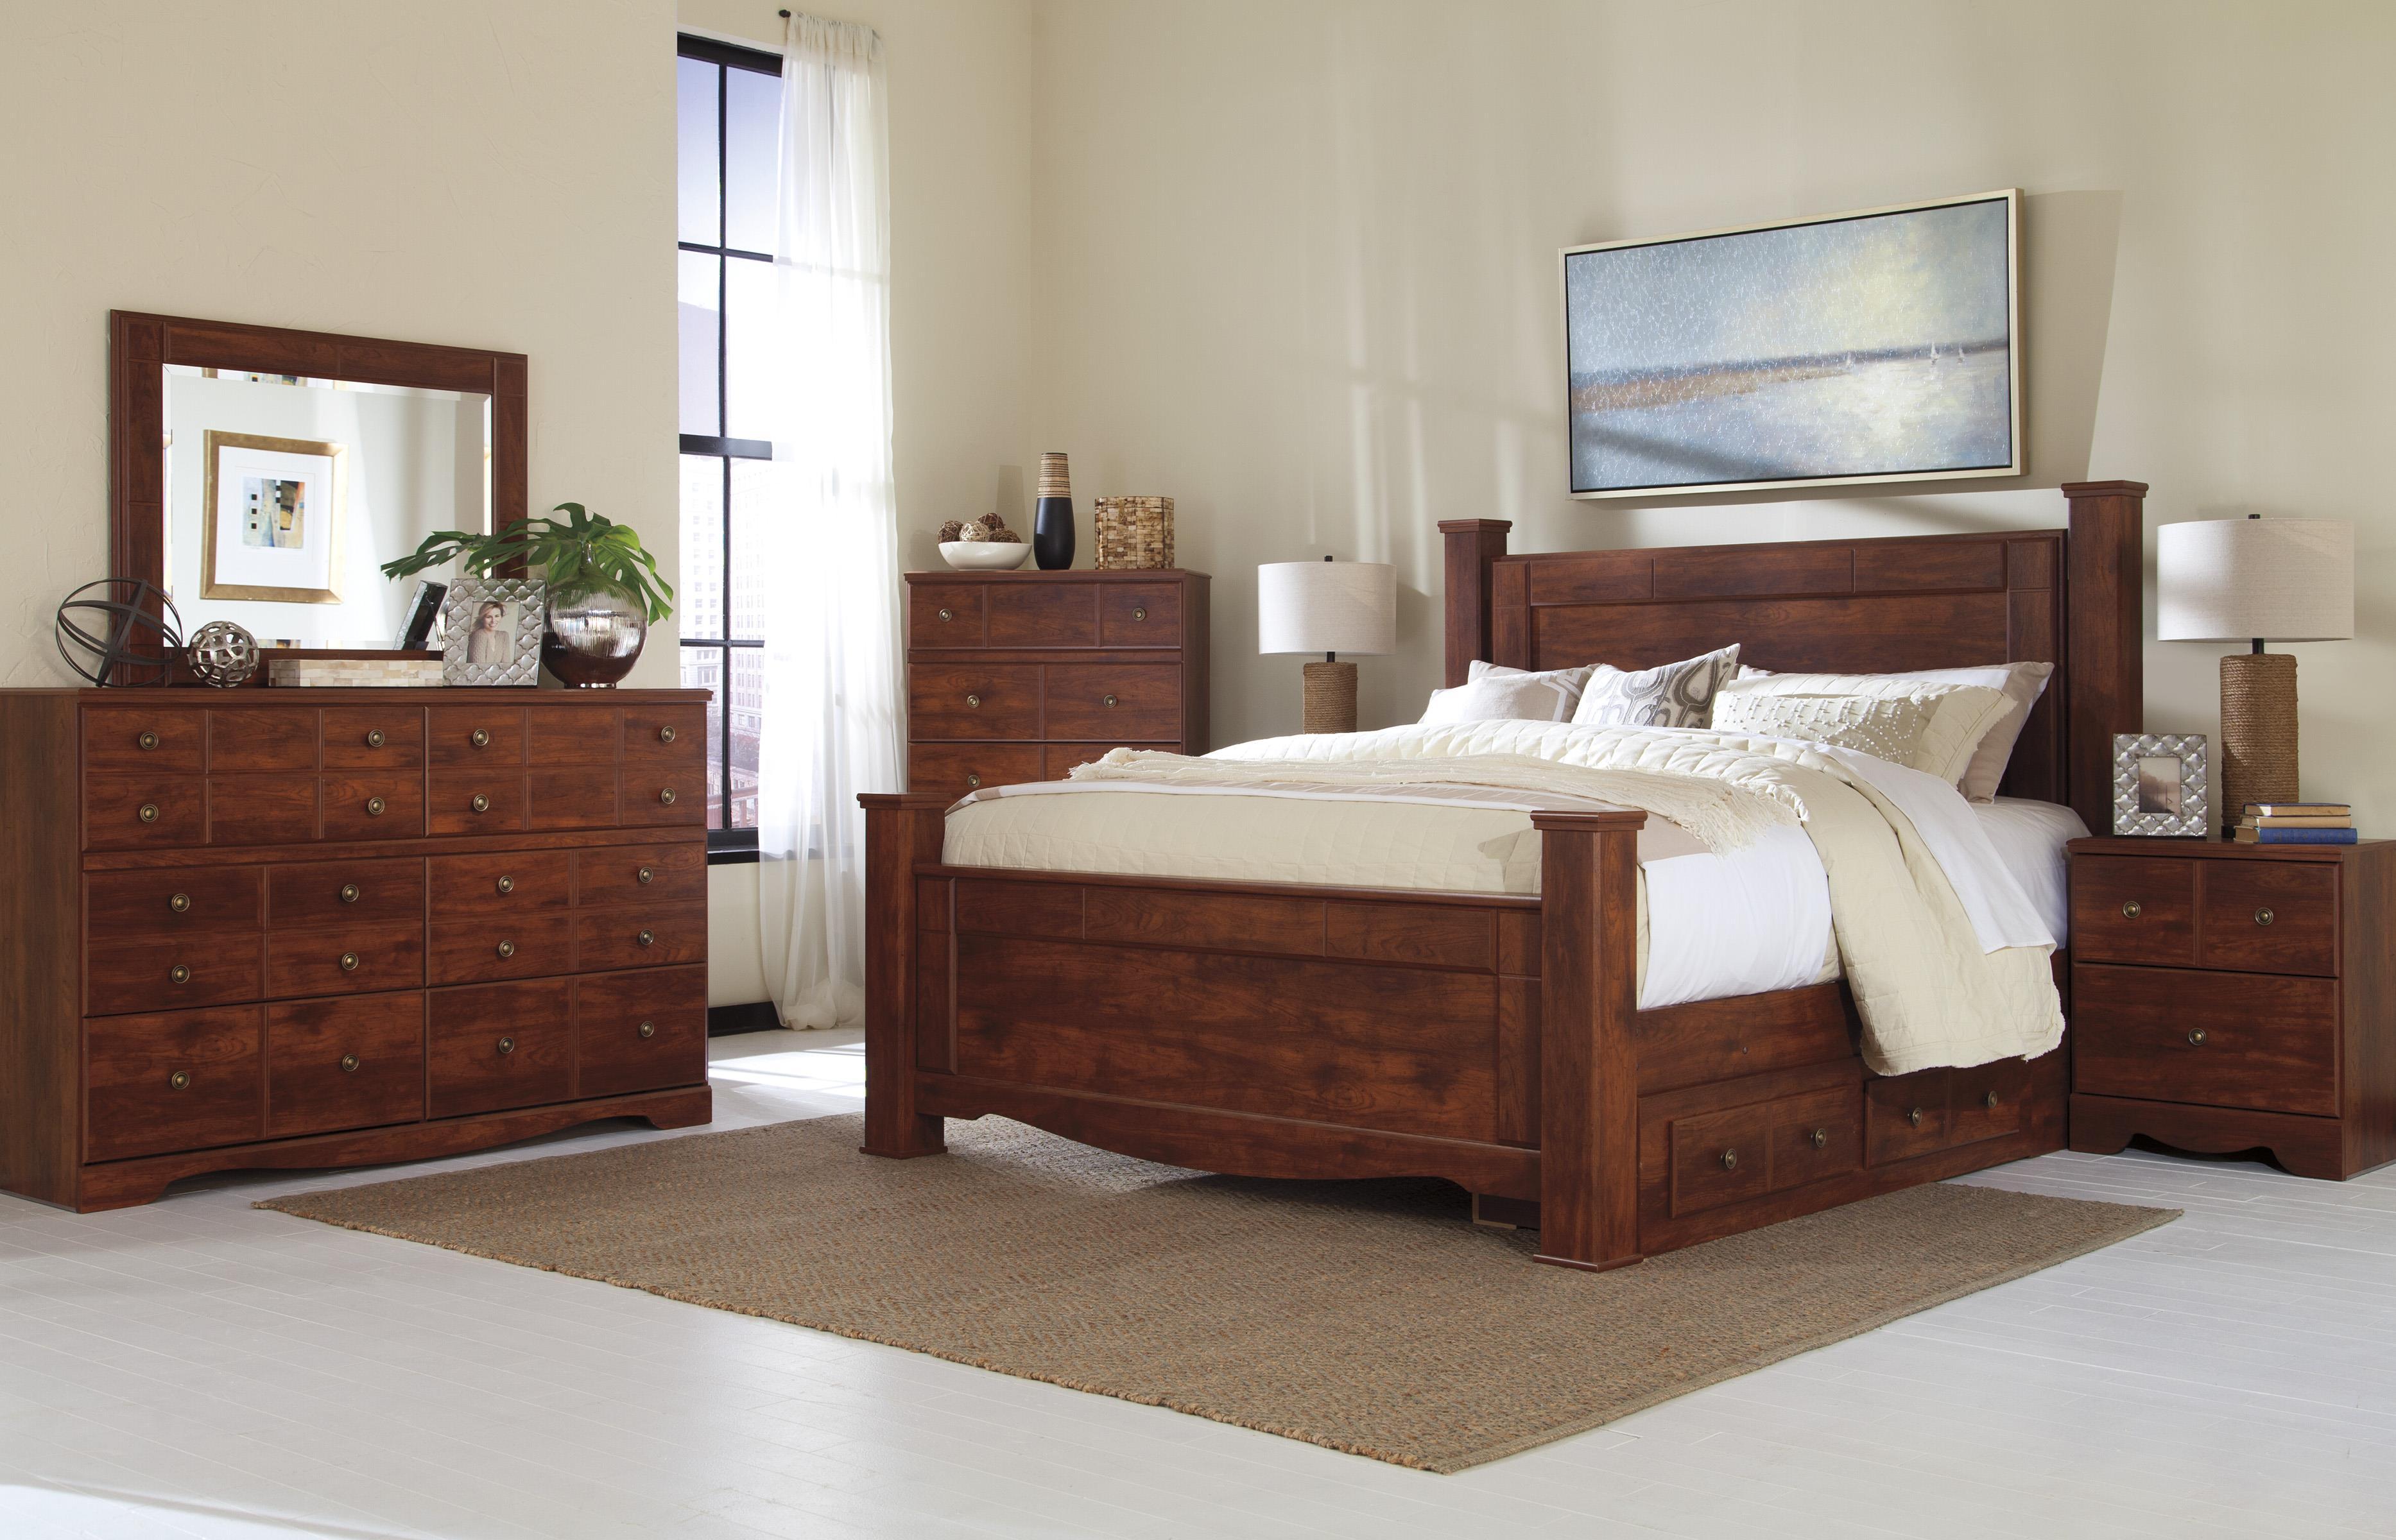 Signature Design by Ashley Brittberg King Bedroom Group - Item Number: B265 K Bedroom Group 1